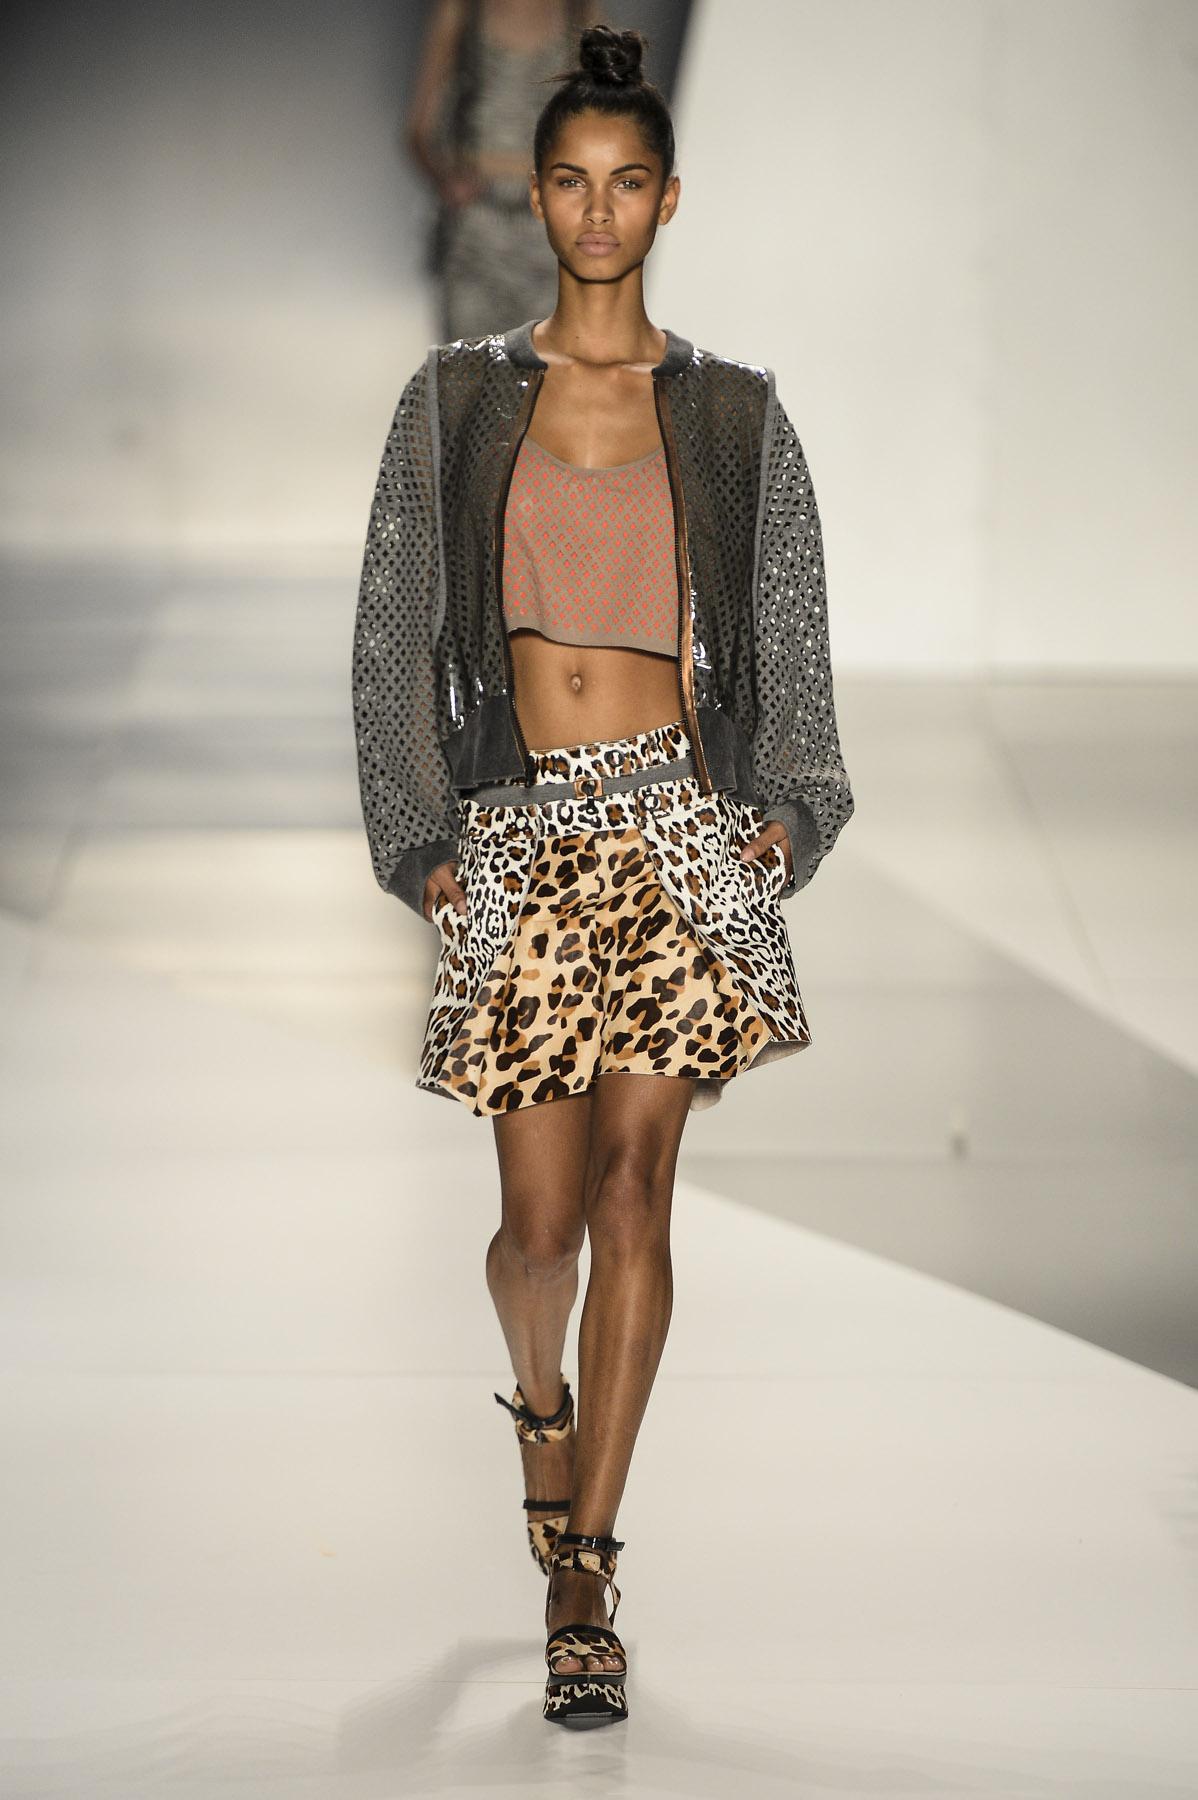 Cole O Espa O Fashion Fashion Rio Ver O 2014 Rtw Desfiles Ffw